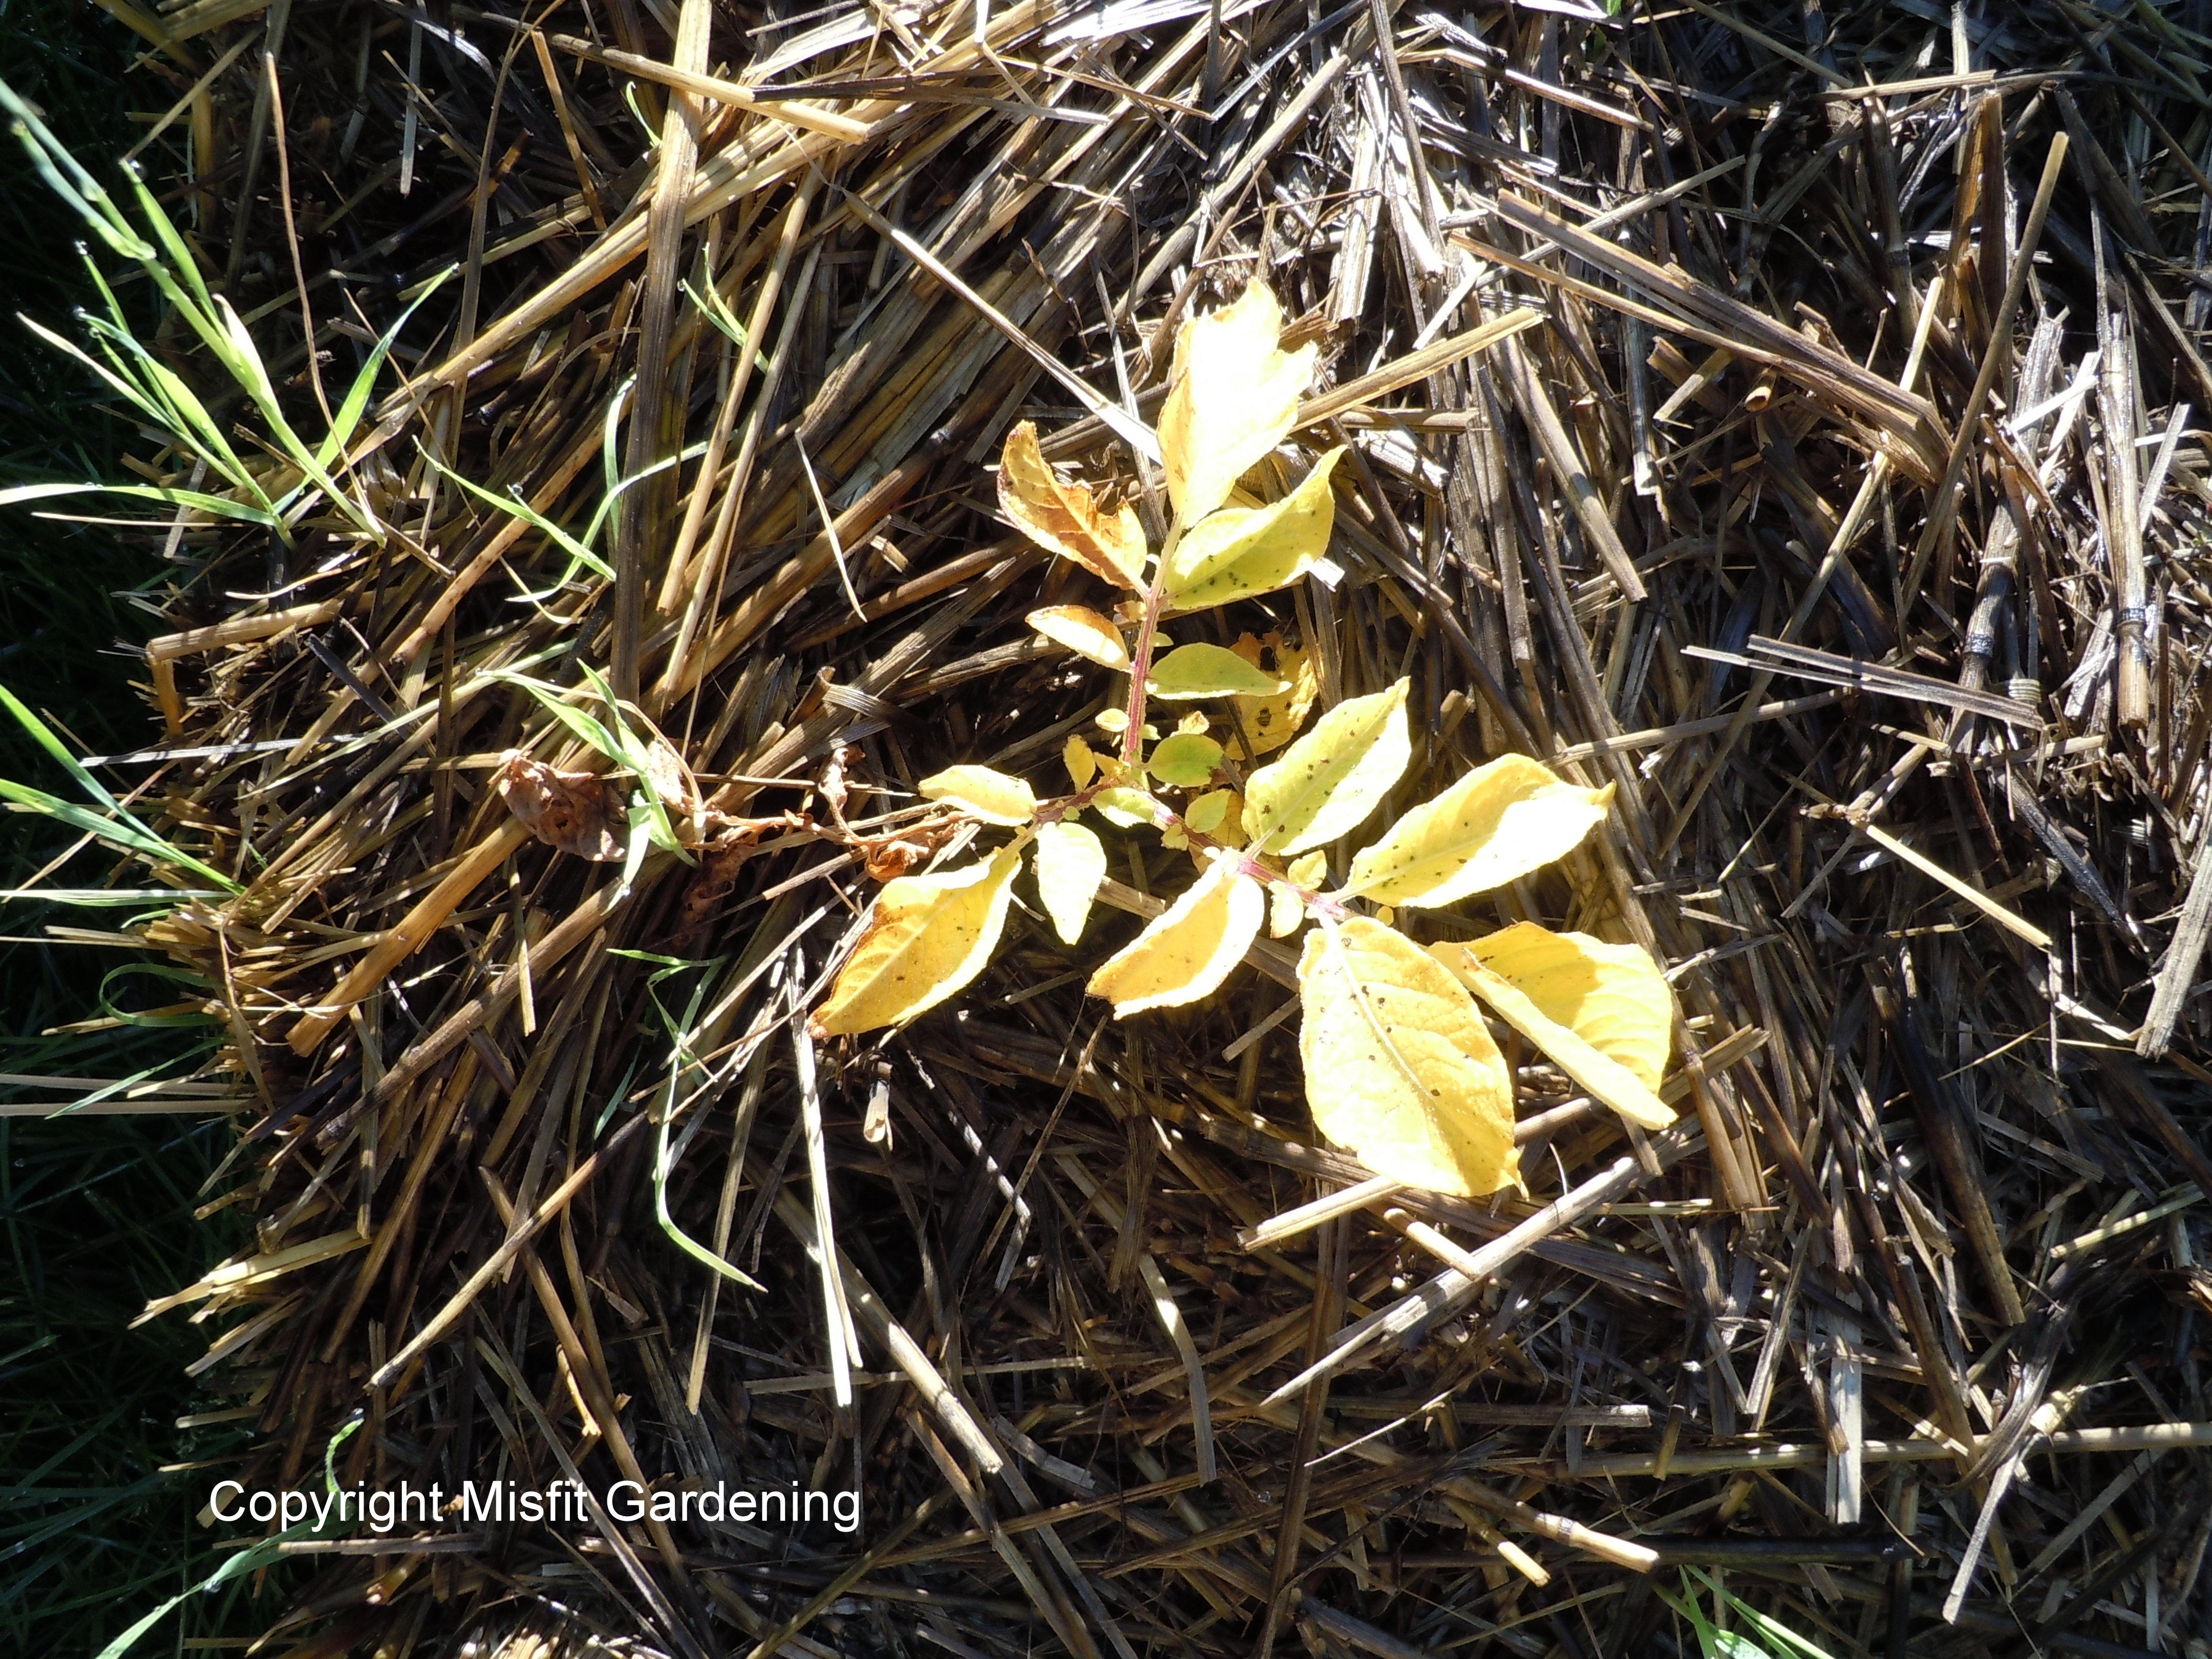 Hay bale Garden Update - Misfit Gardening